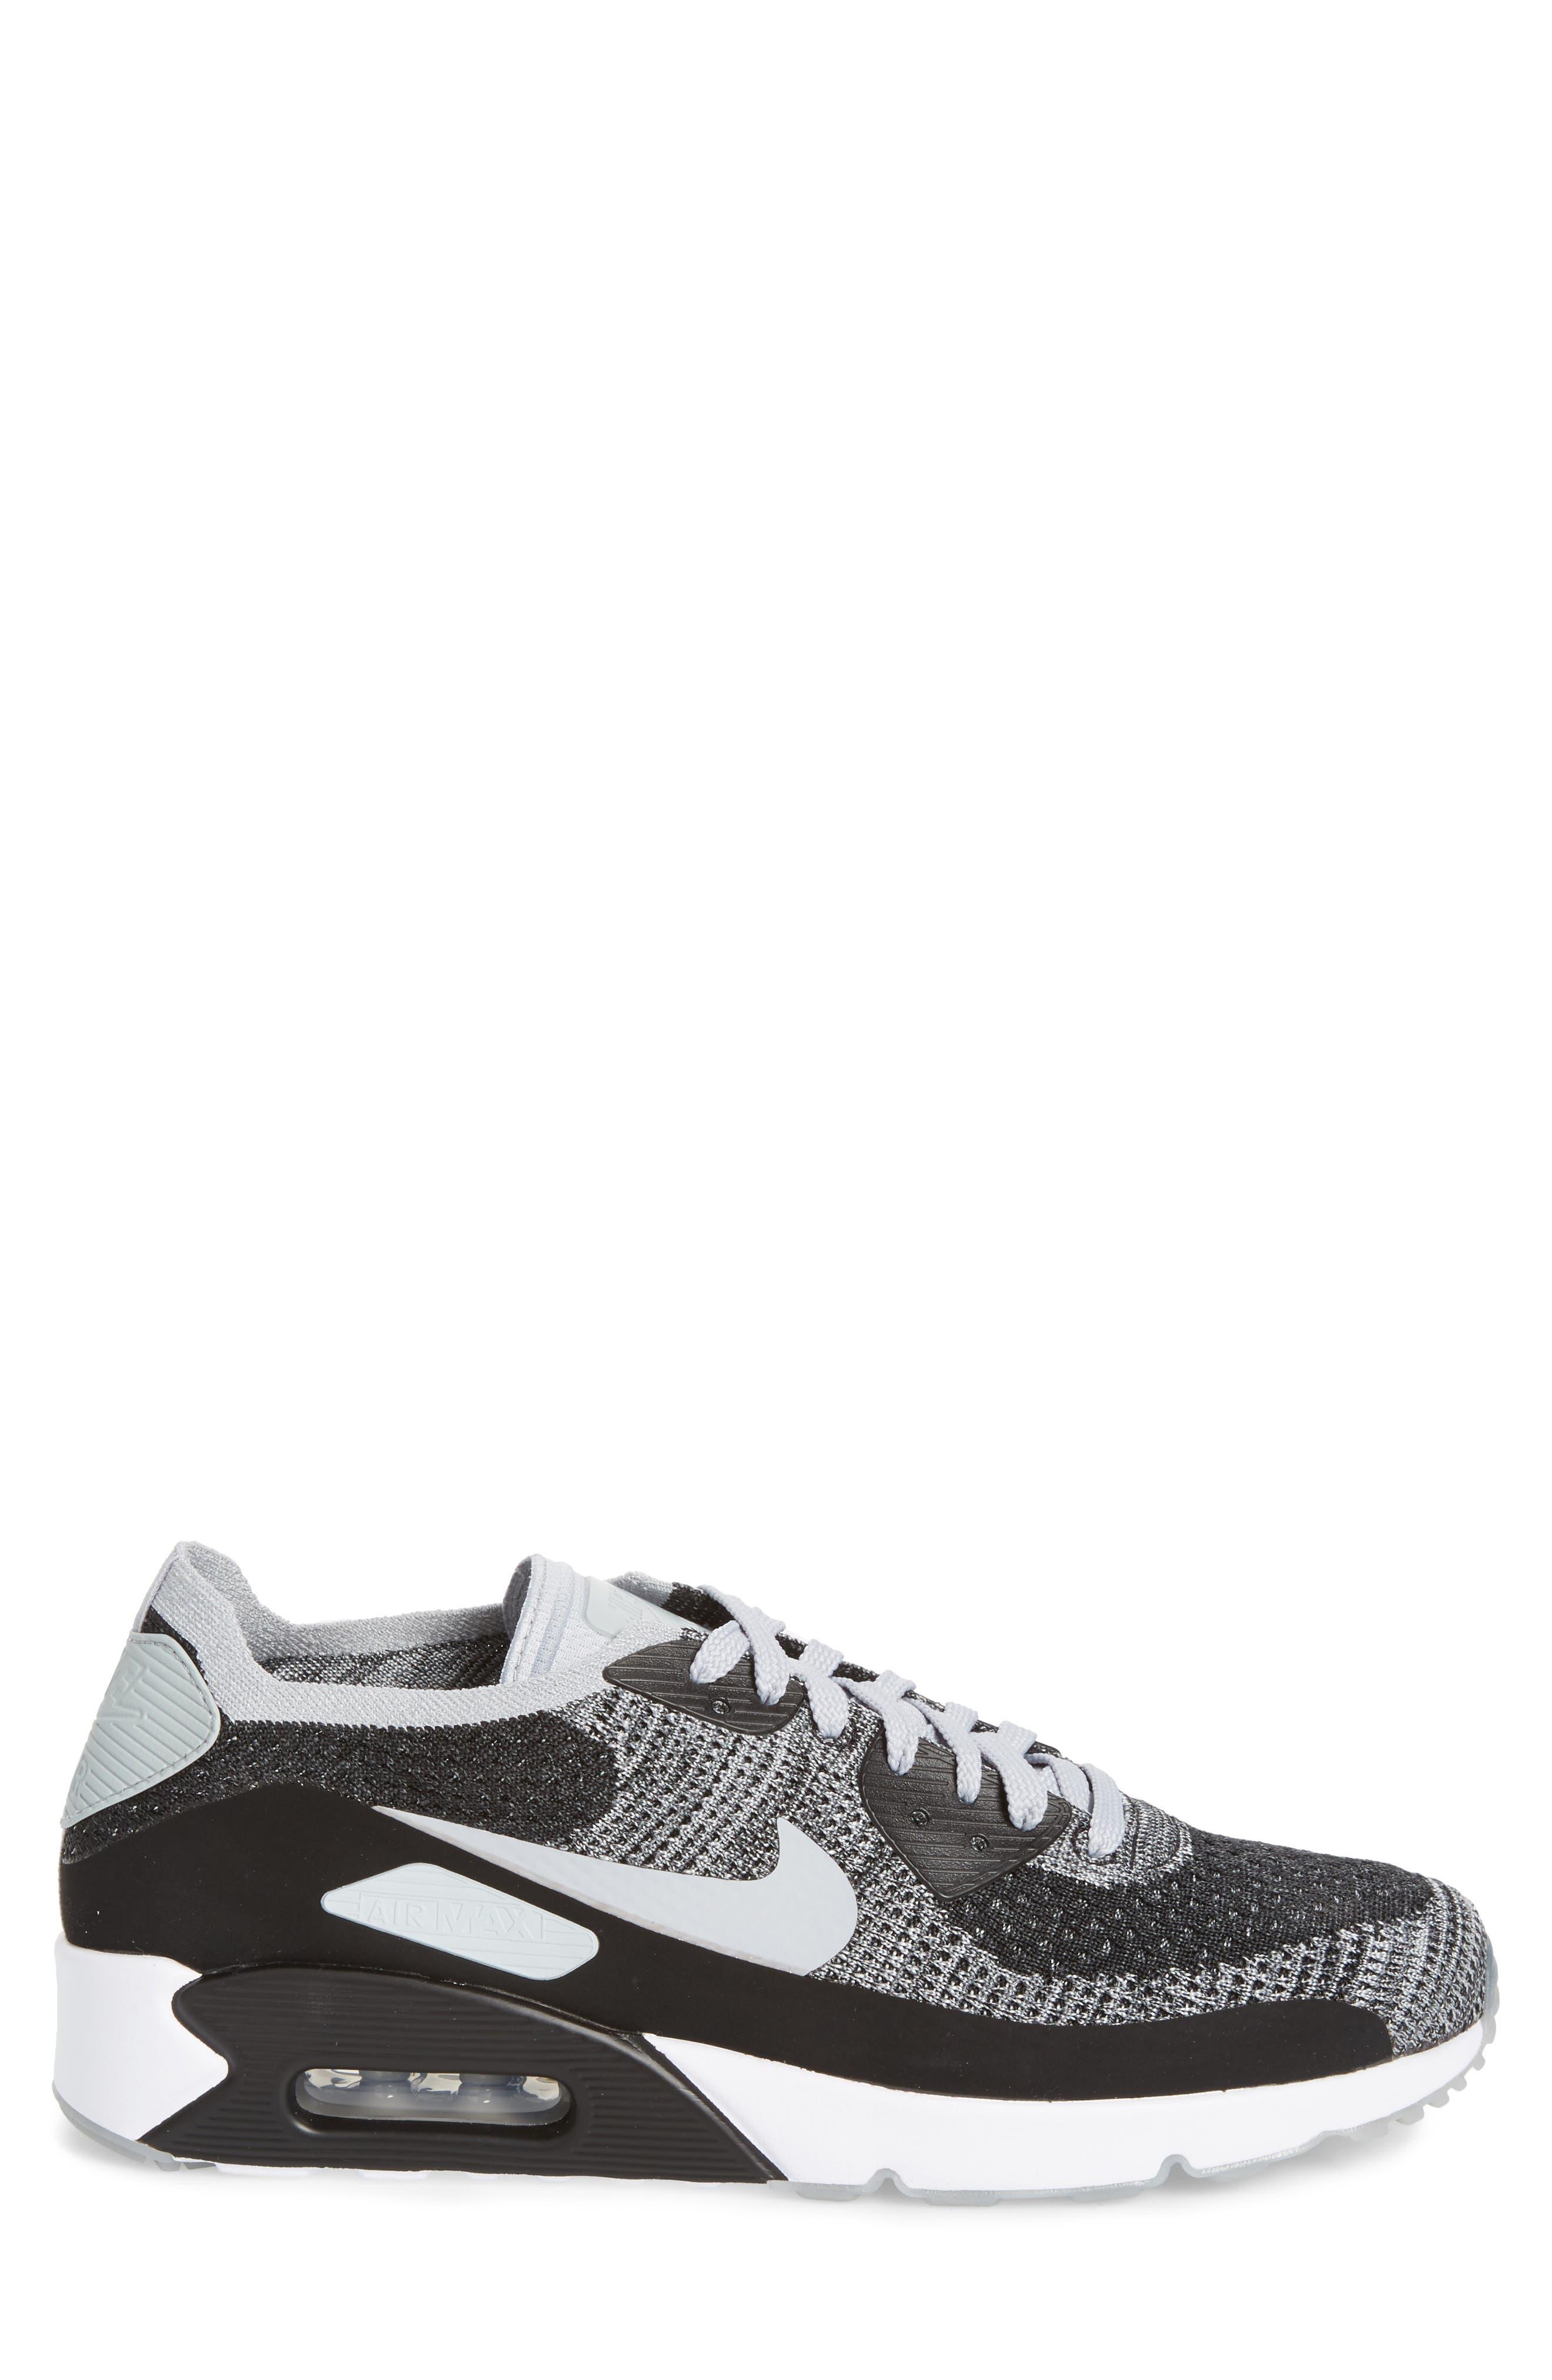 Air Max 90 Ultra 2.0 Flyknit Sneaker,                             Alternate thumbnail 3, color,                             005